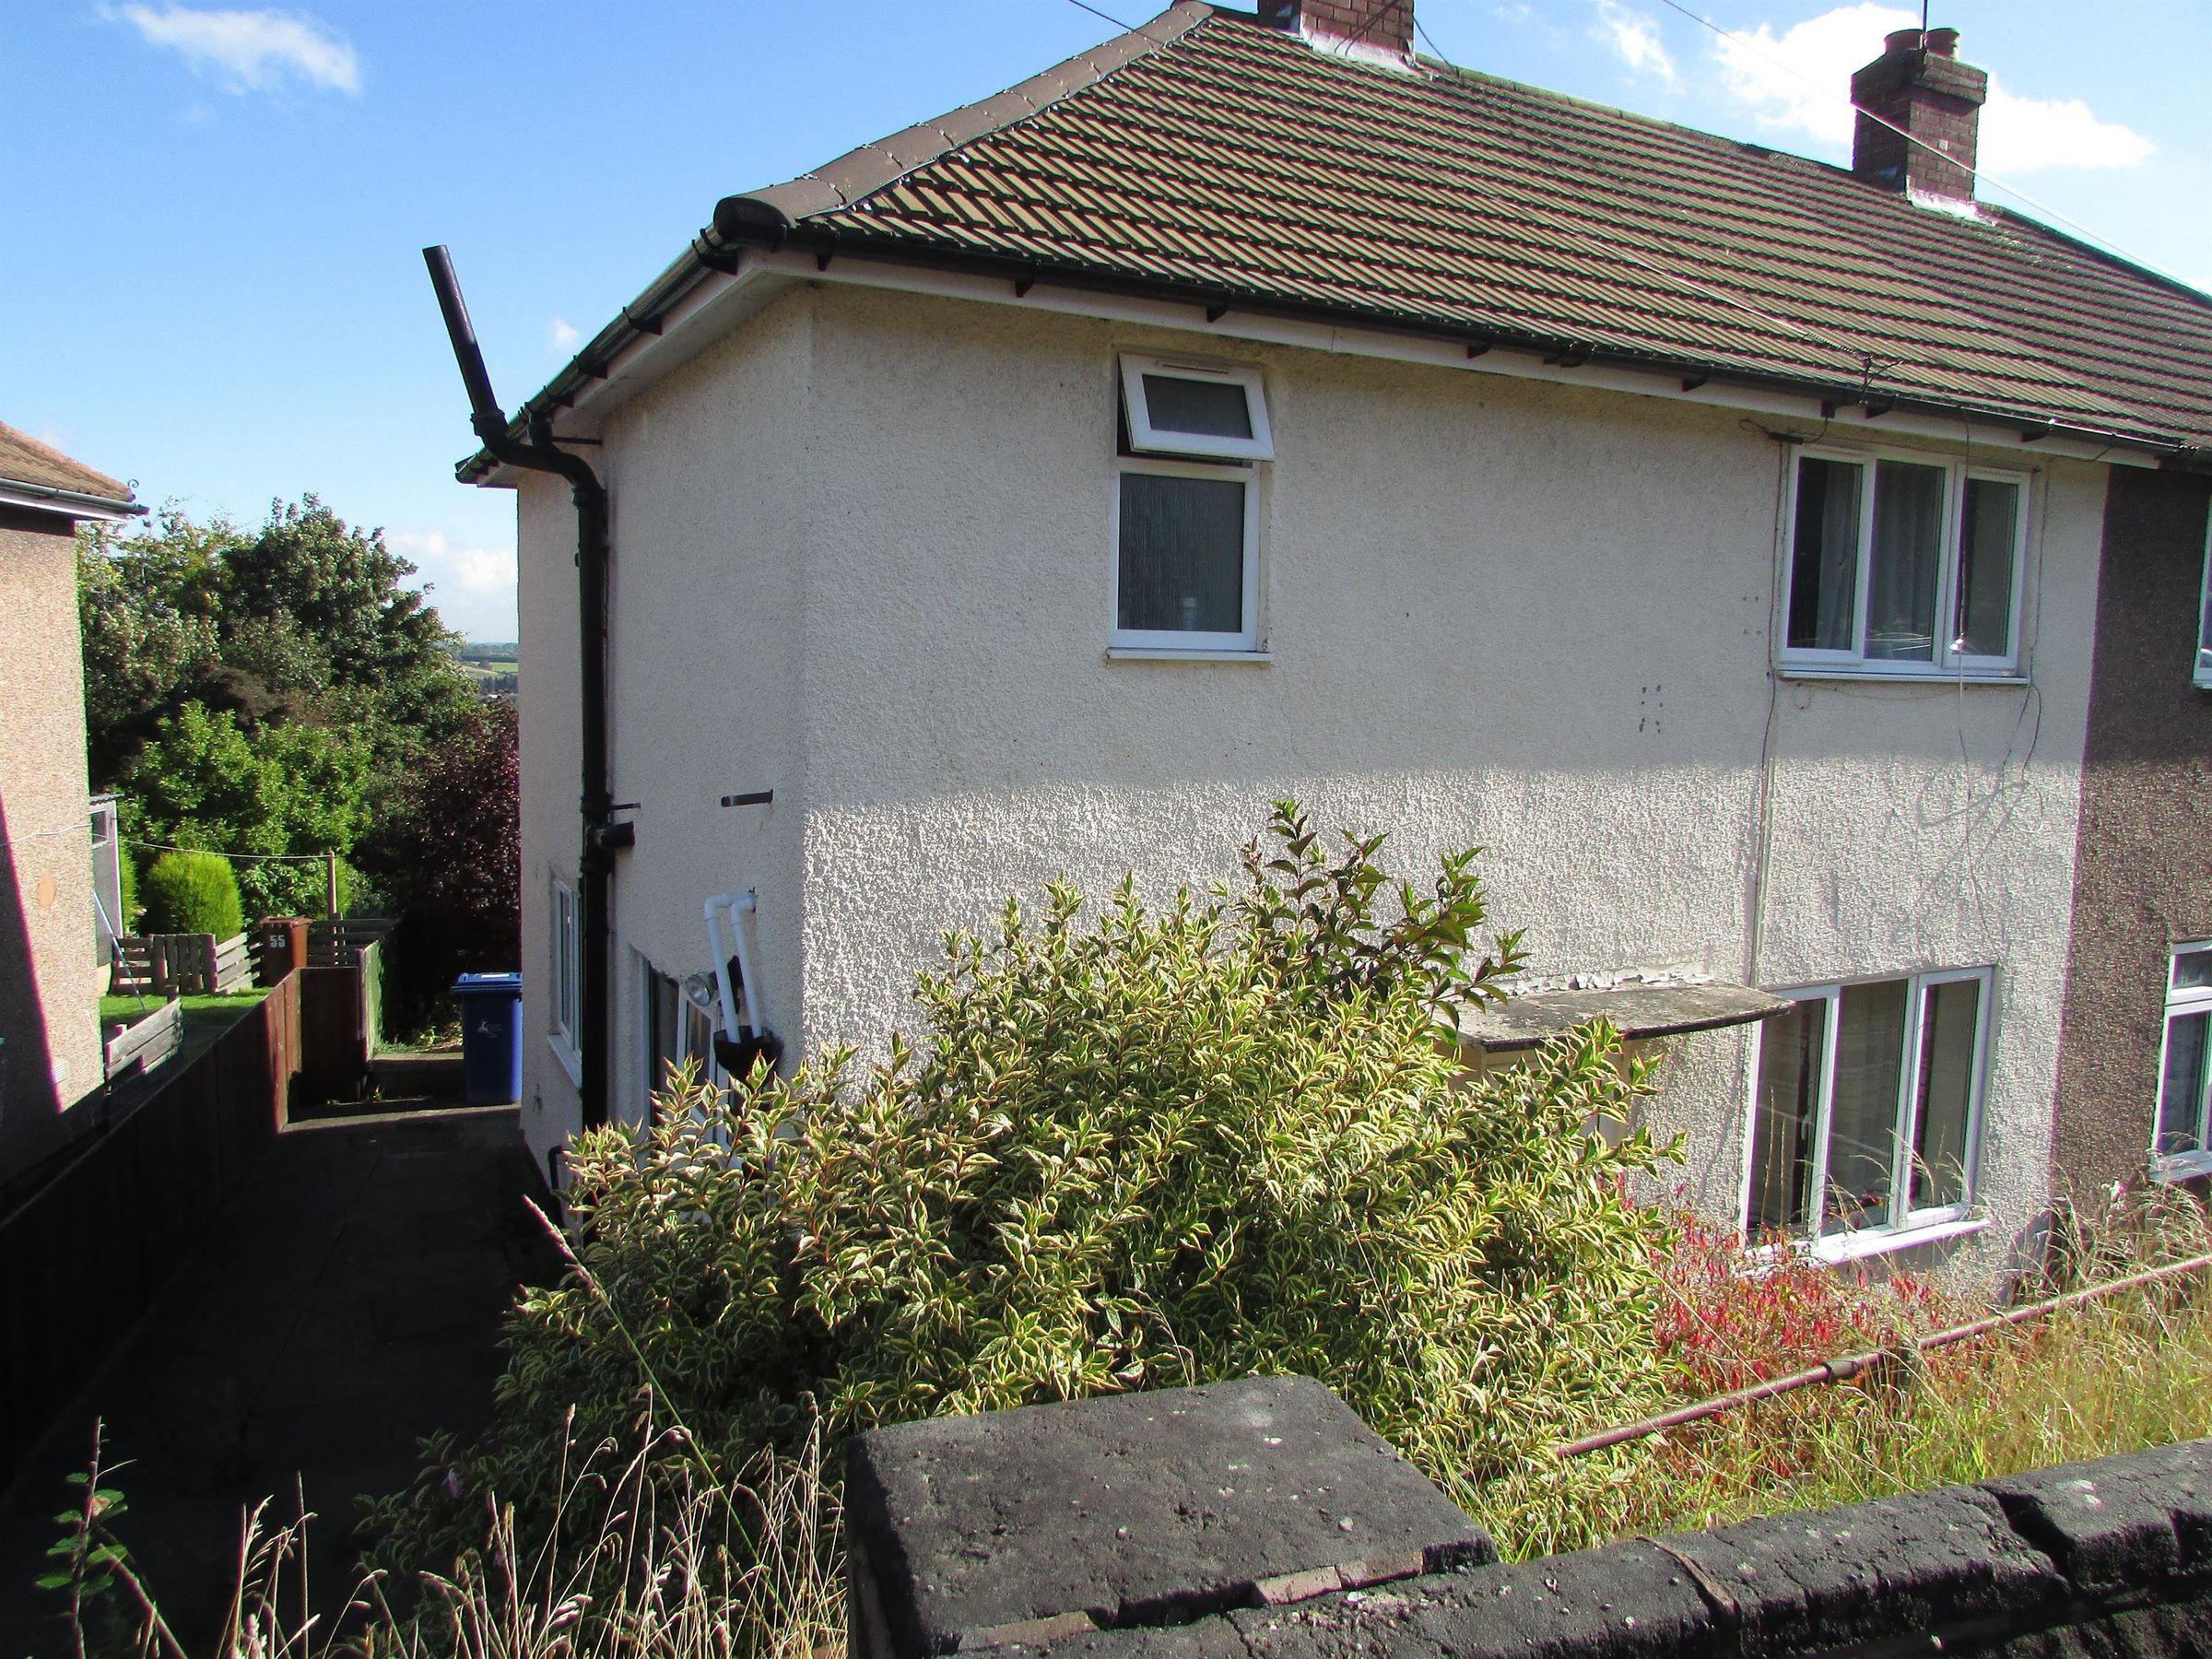 Property photo 1 of 9.